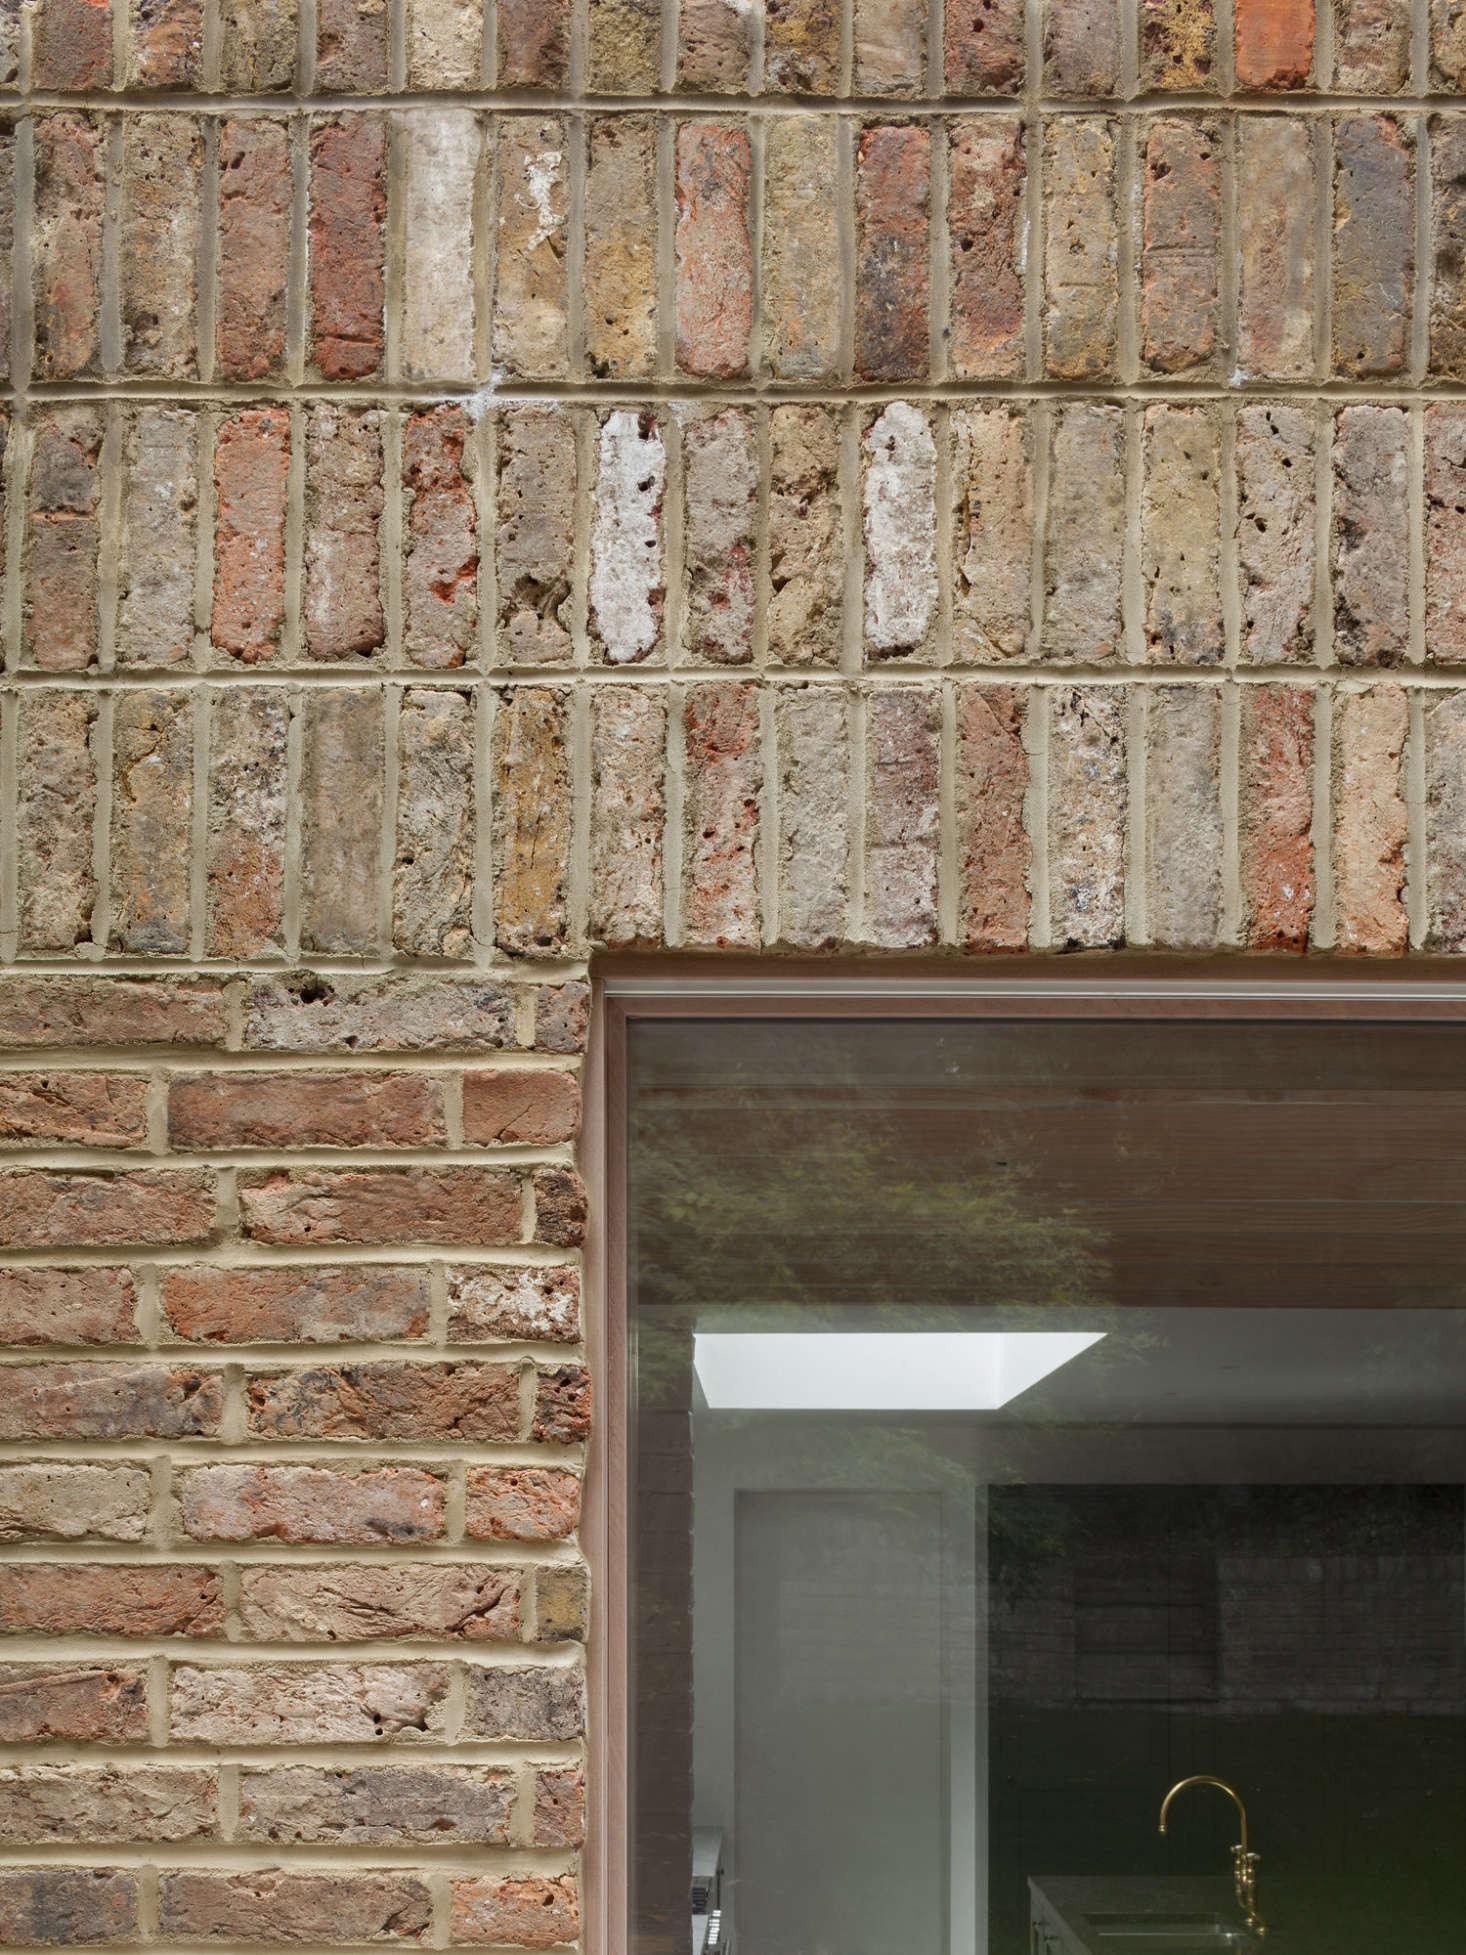 A look at where the sapele wood sliding door frame meets the brick façade.